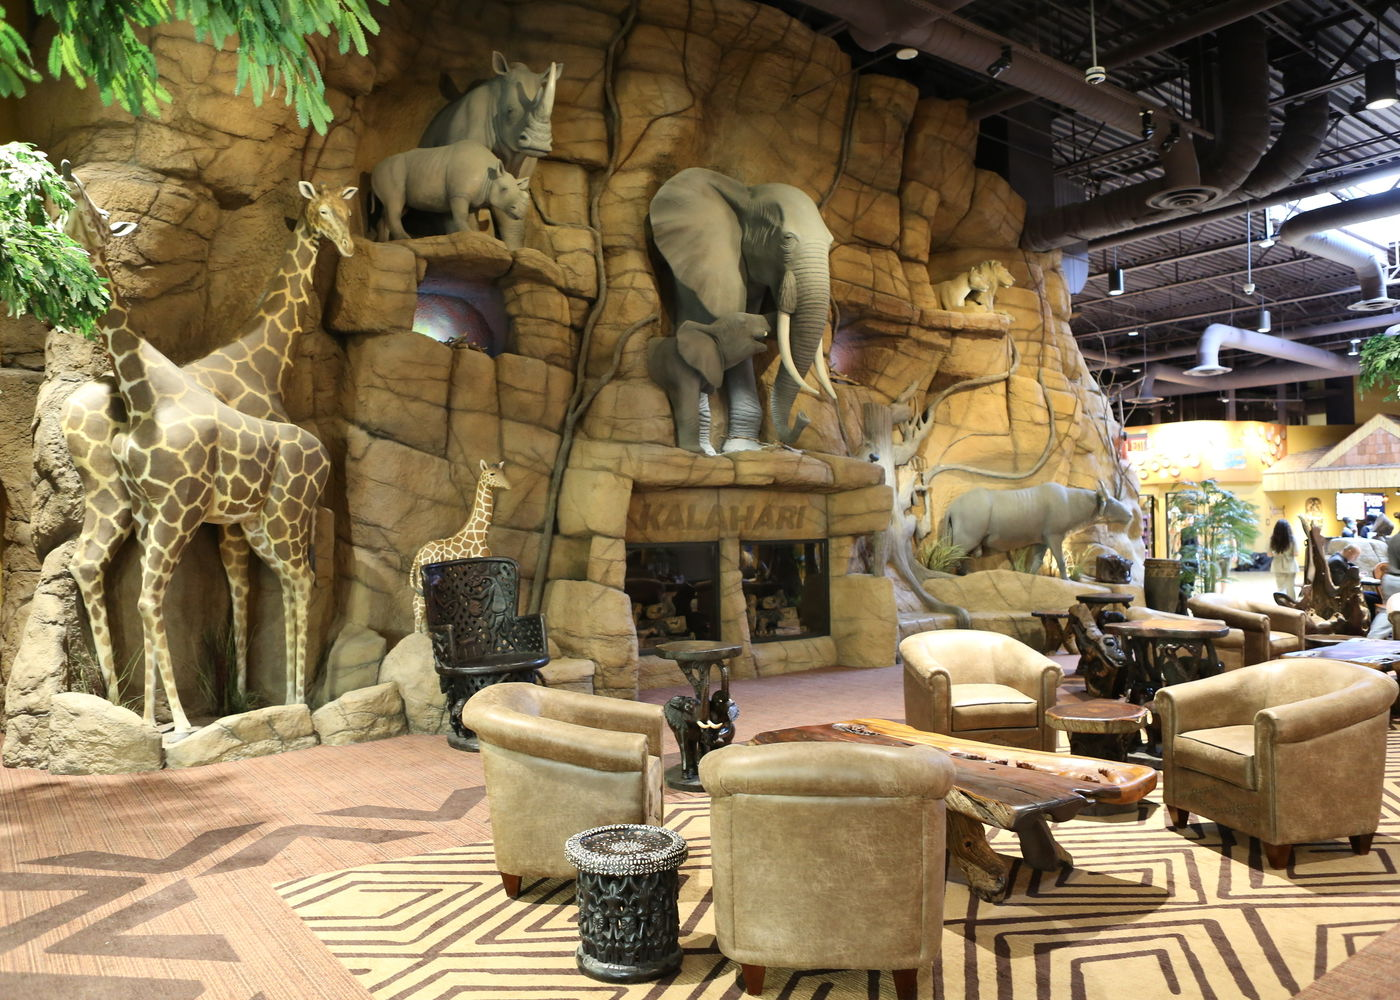 Kalahari Resort Pa >> Kalahari Resorts Conventions Pocono Manor Pa 18349